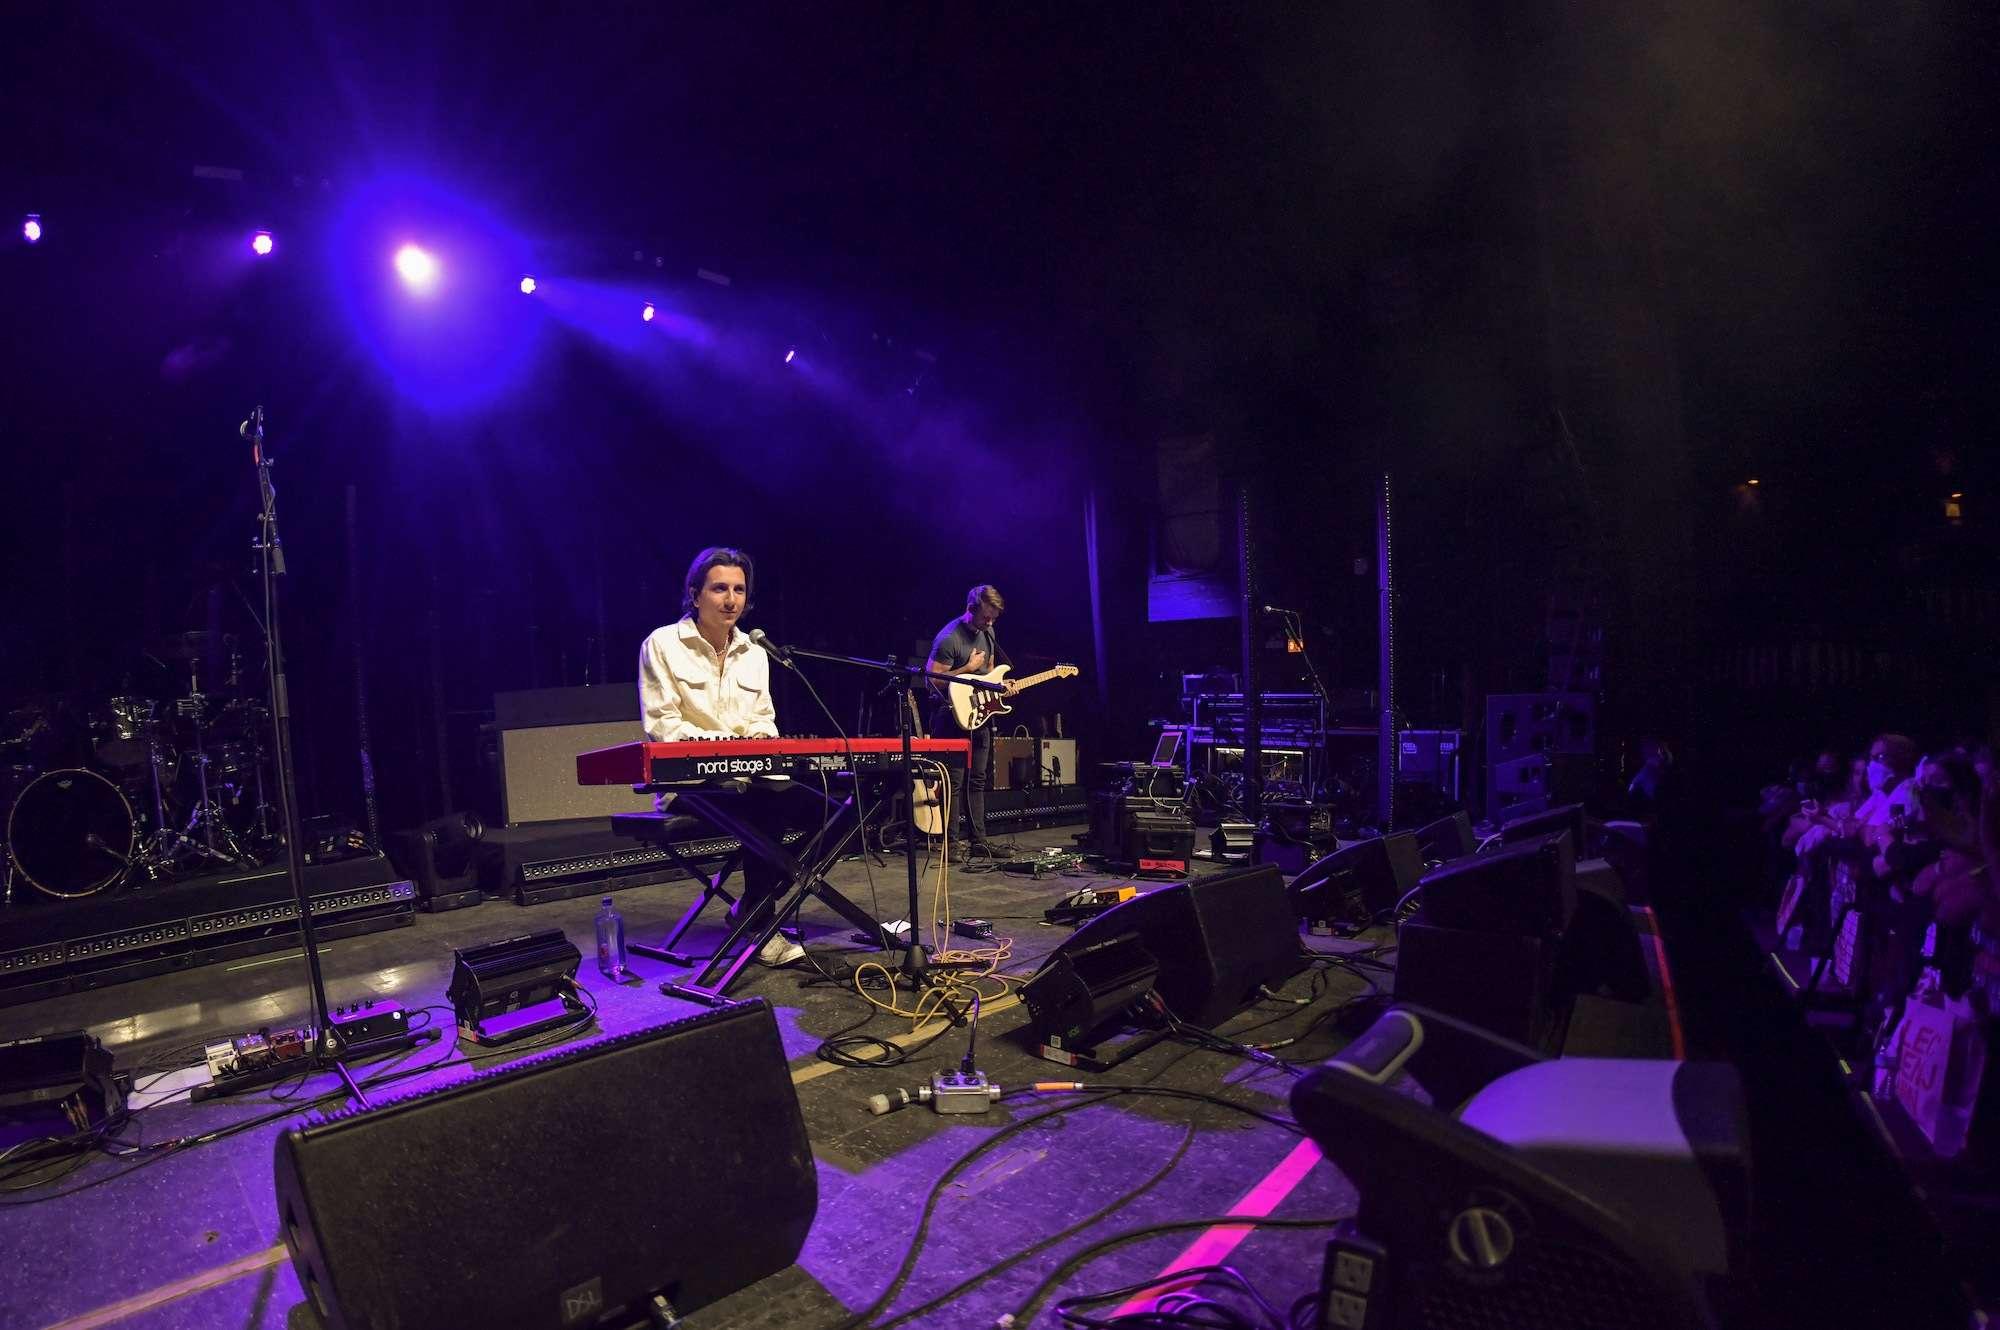 Anson Seabra Live at Riviera [GALLERY] 2